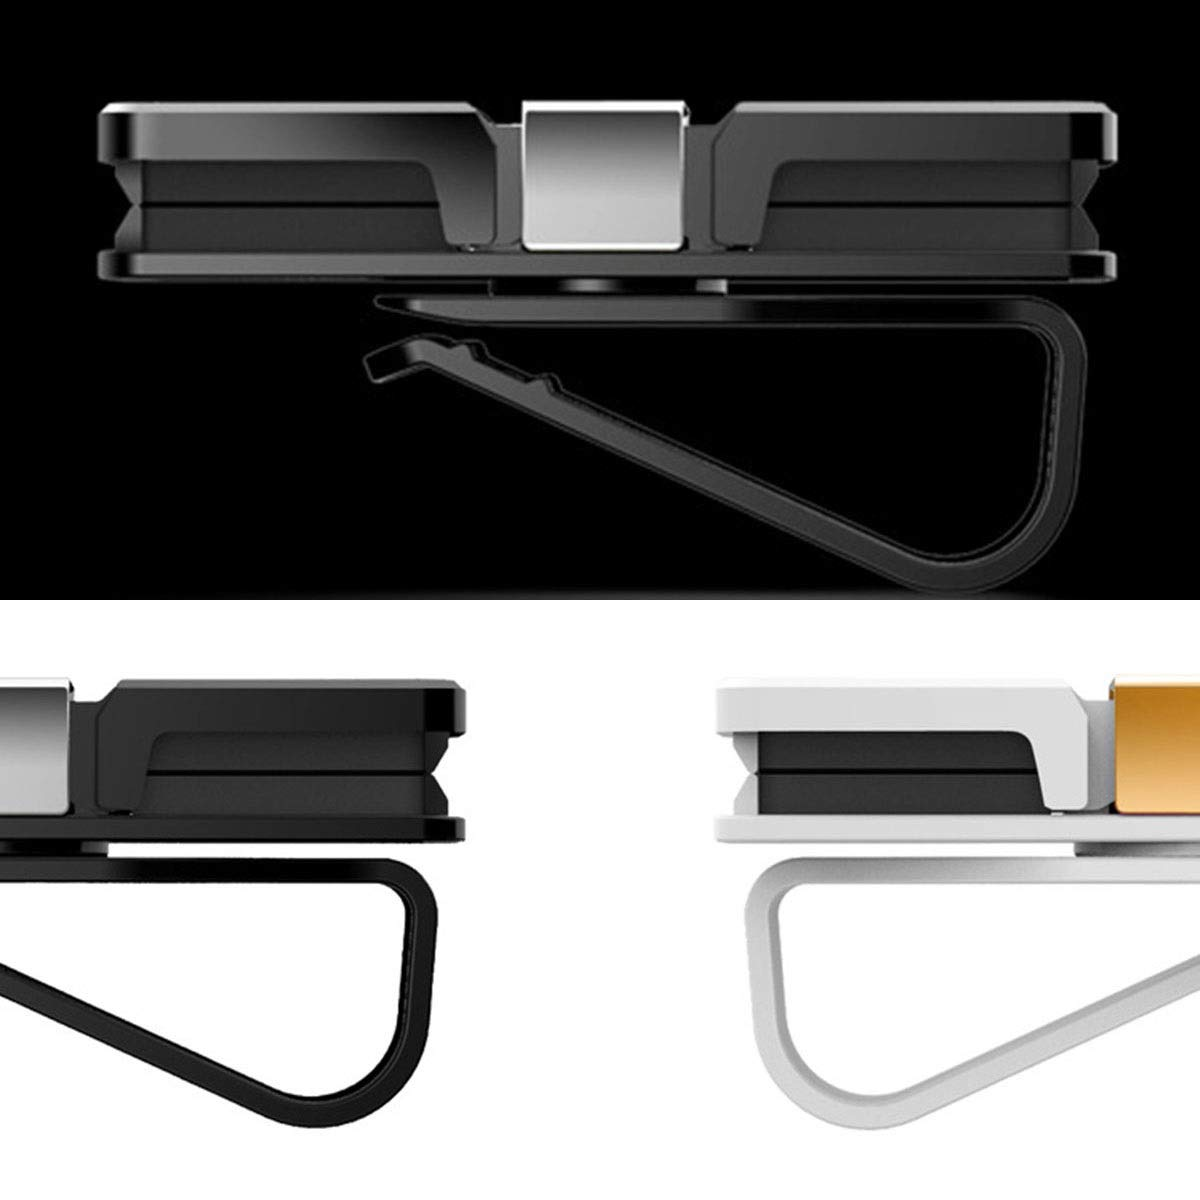 DEALPEAK Rotatable Glasses Holder For Sun Visor//Air Vent,Sunglasses Eyeglasses Mount Accessory With Ticket Card Clip Color : White